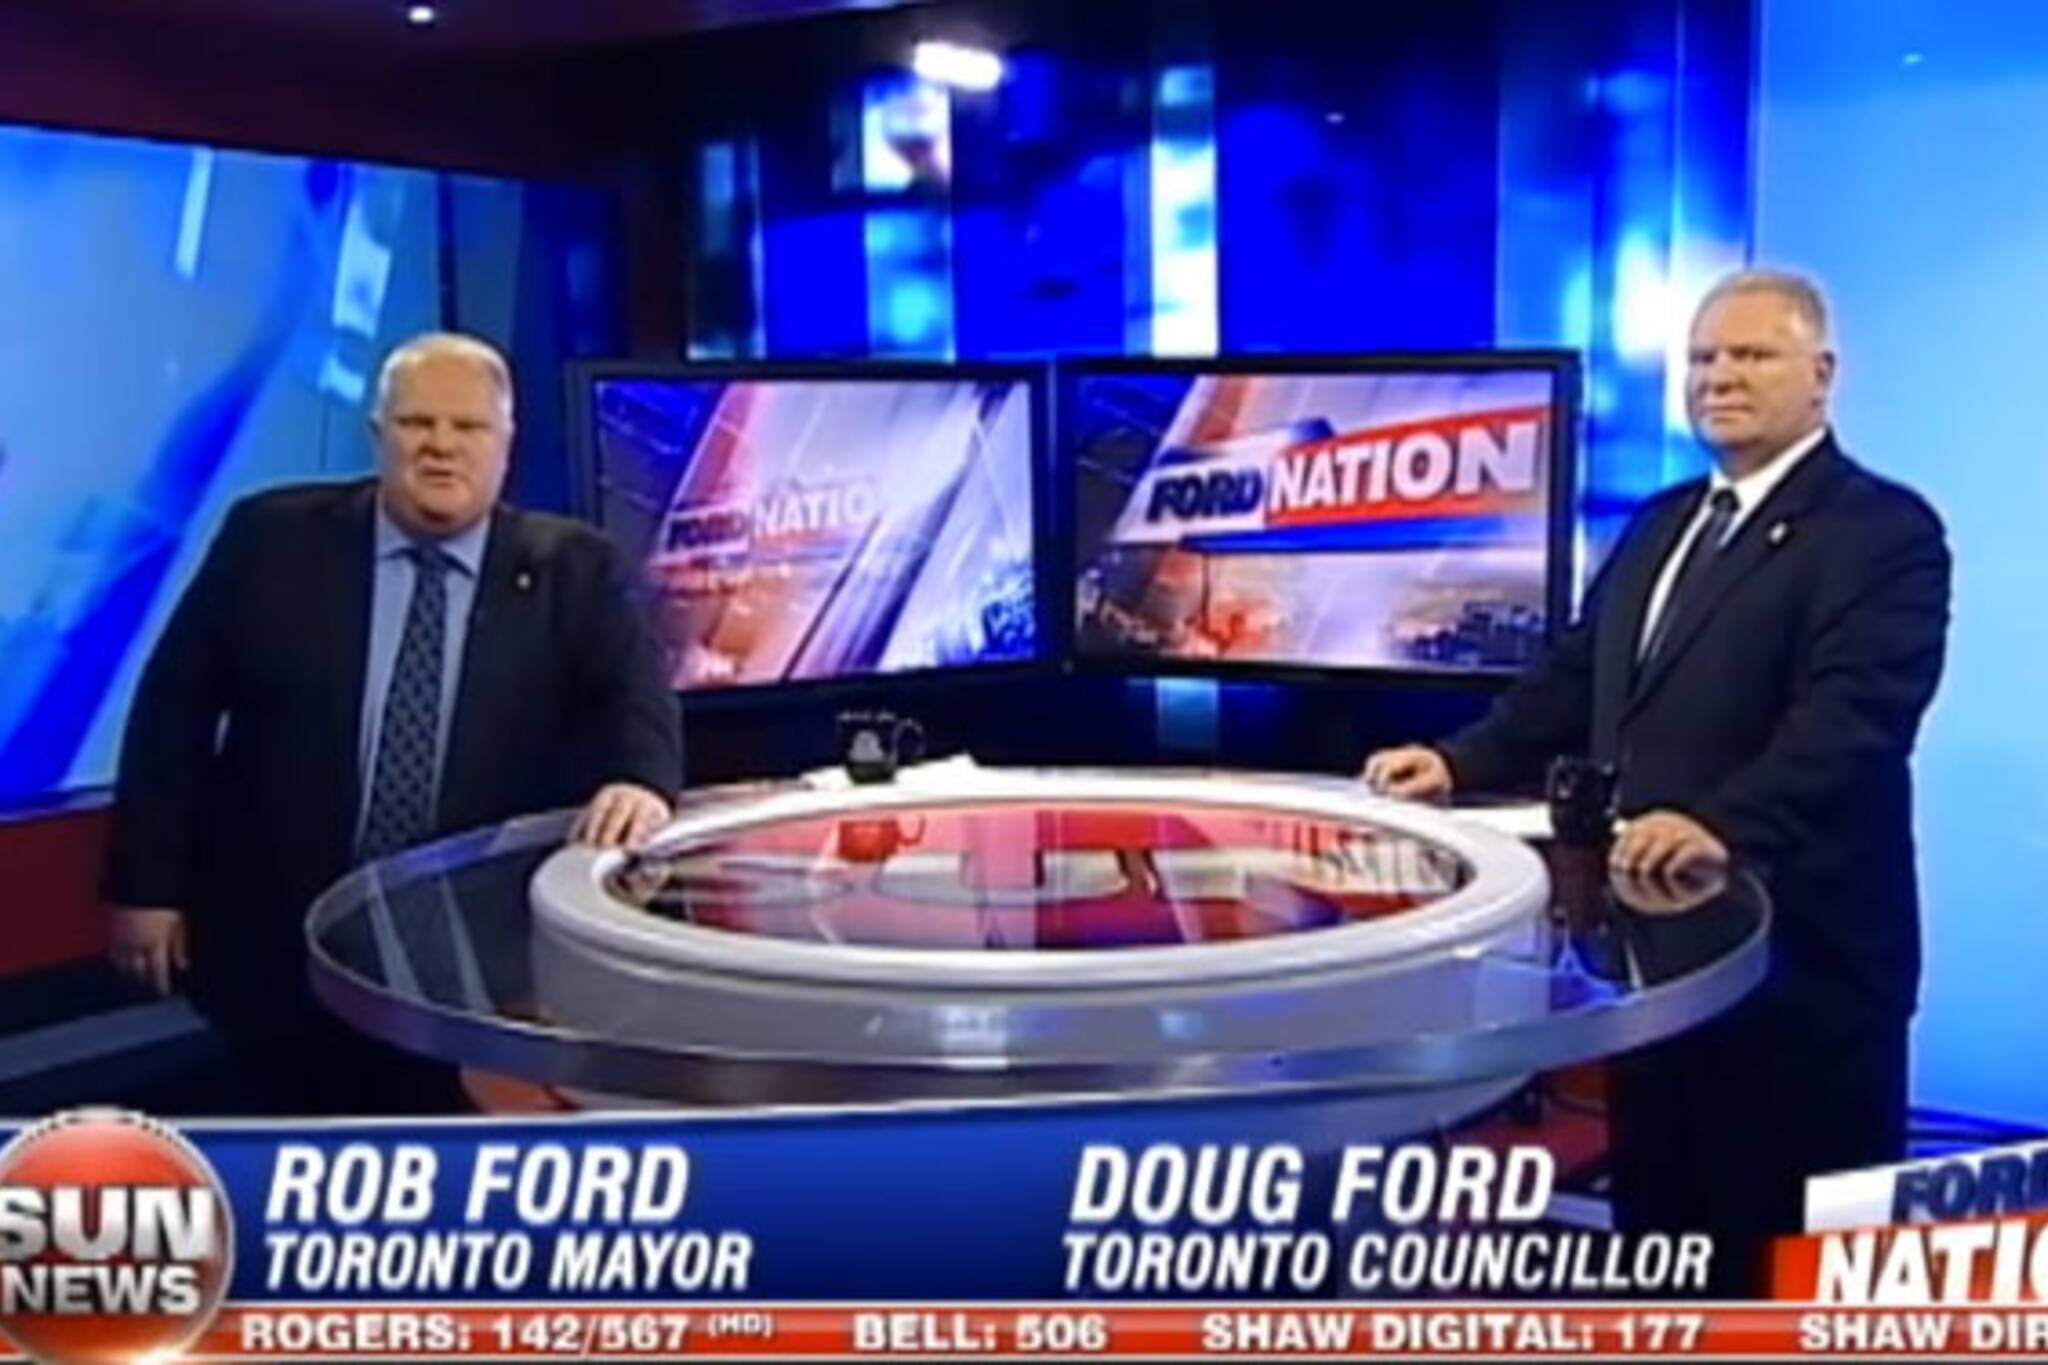 ford nation sun news